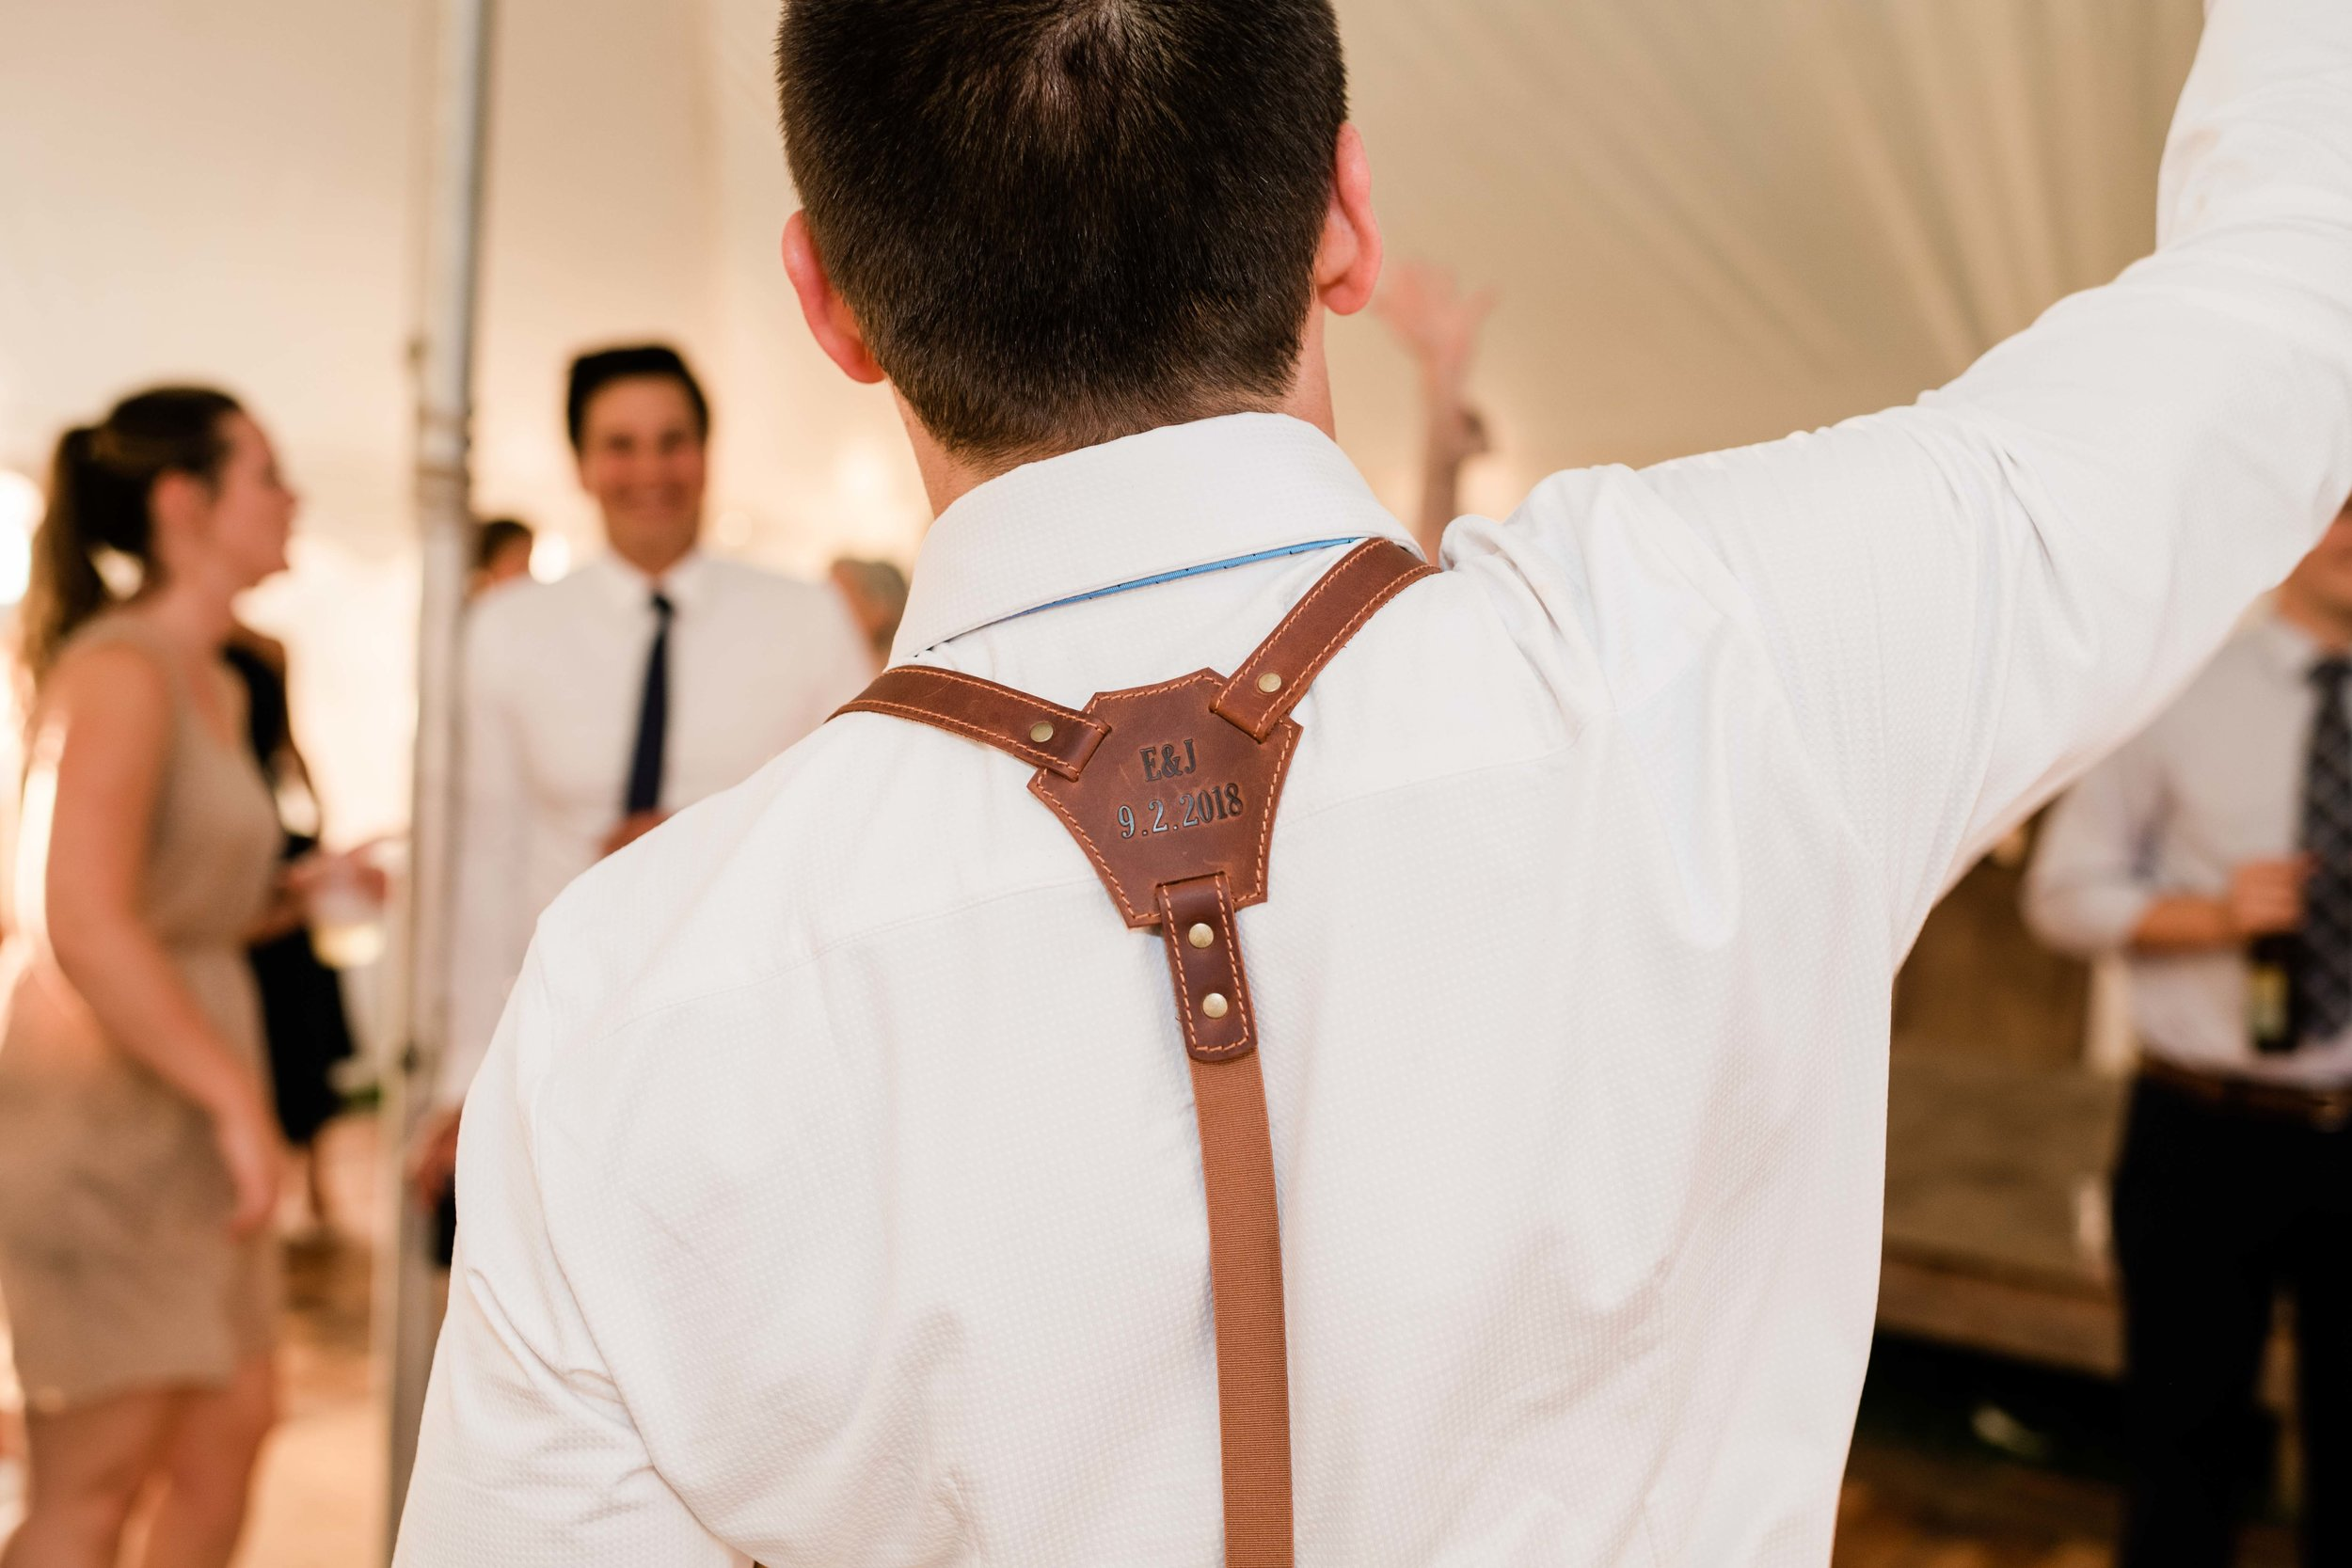 Personalized groom's suspenders